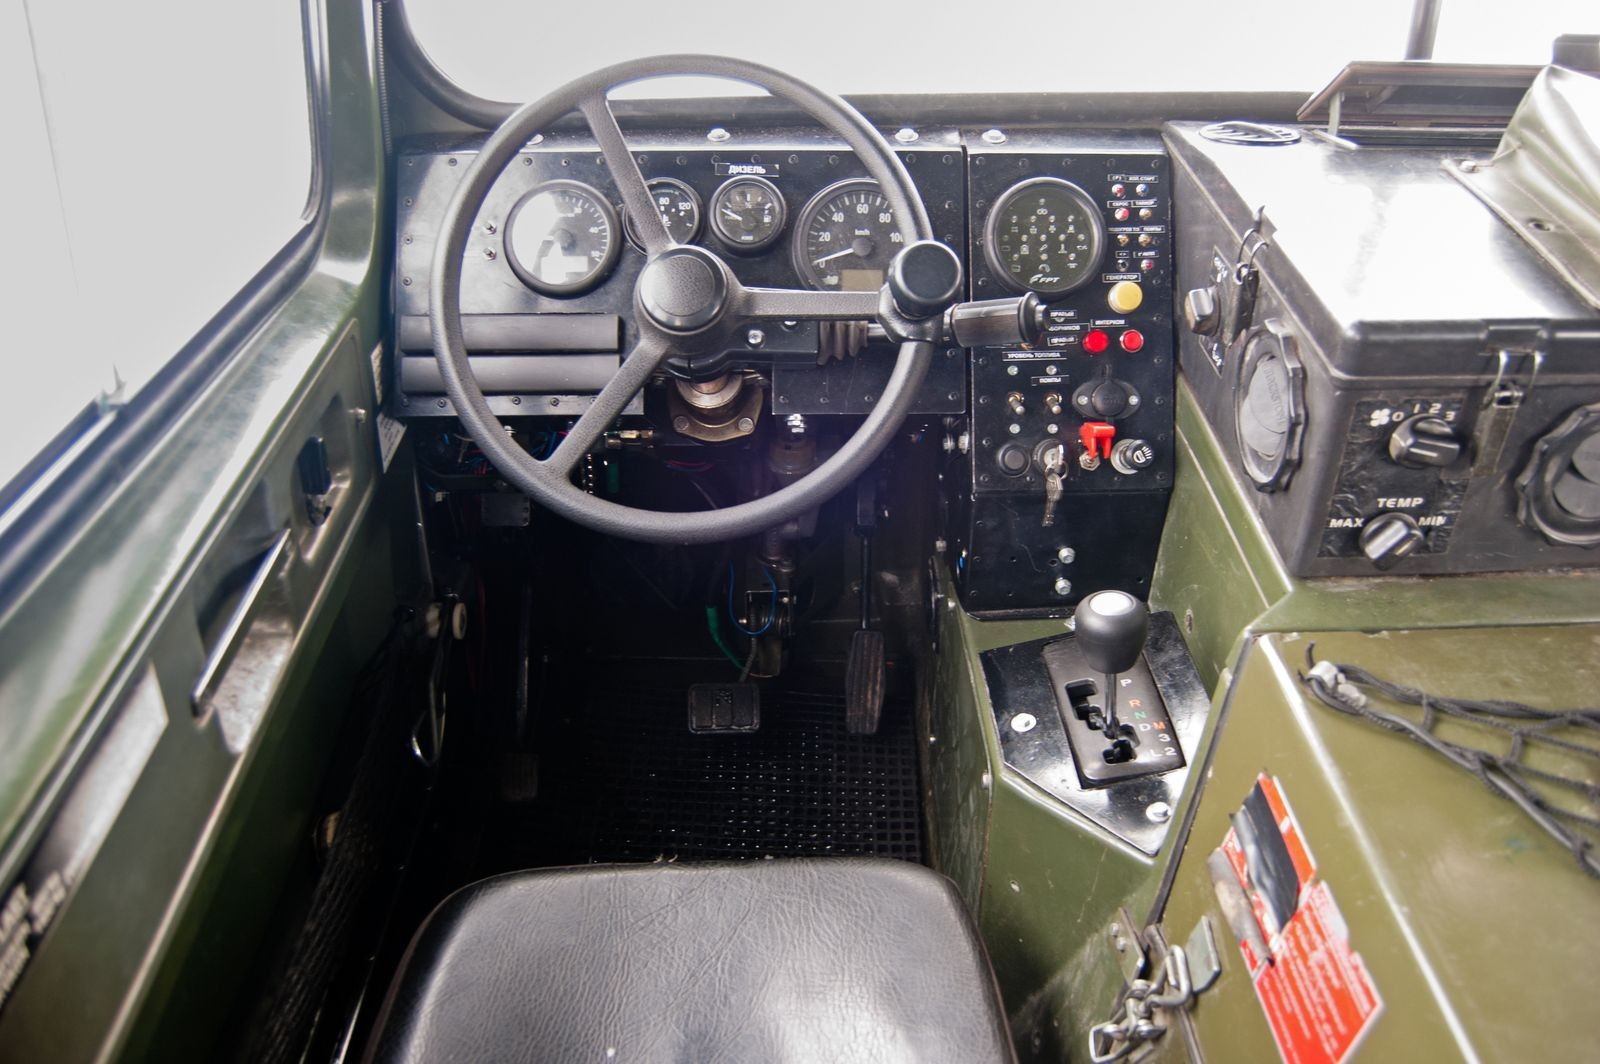 Вместо Форда и Мерседеса: тест-драйв вездехода BV-206 «Лось» с дизелем Iveco